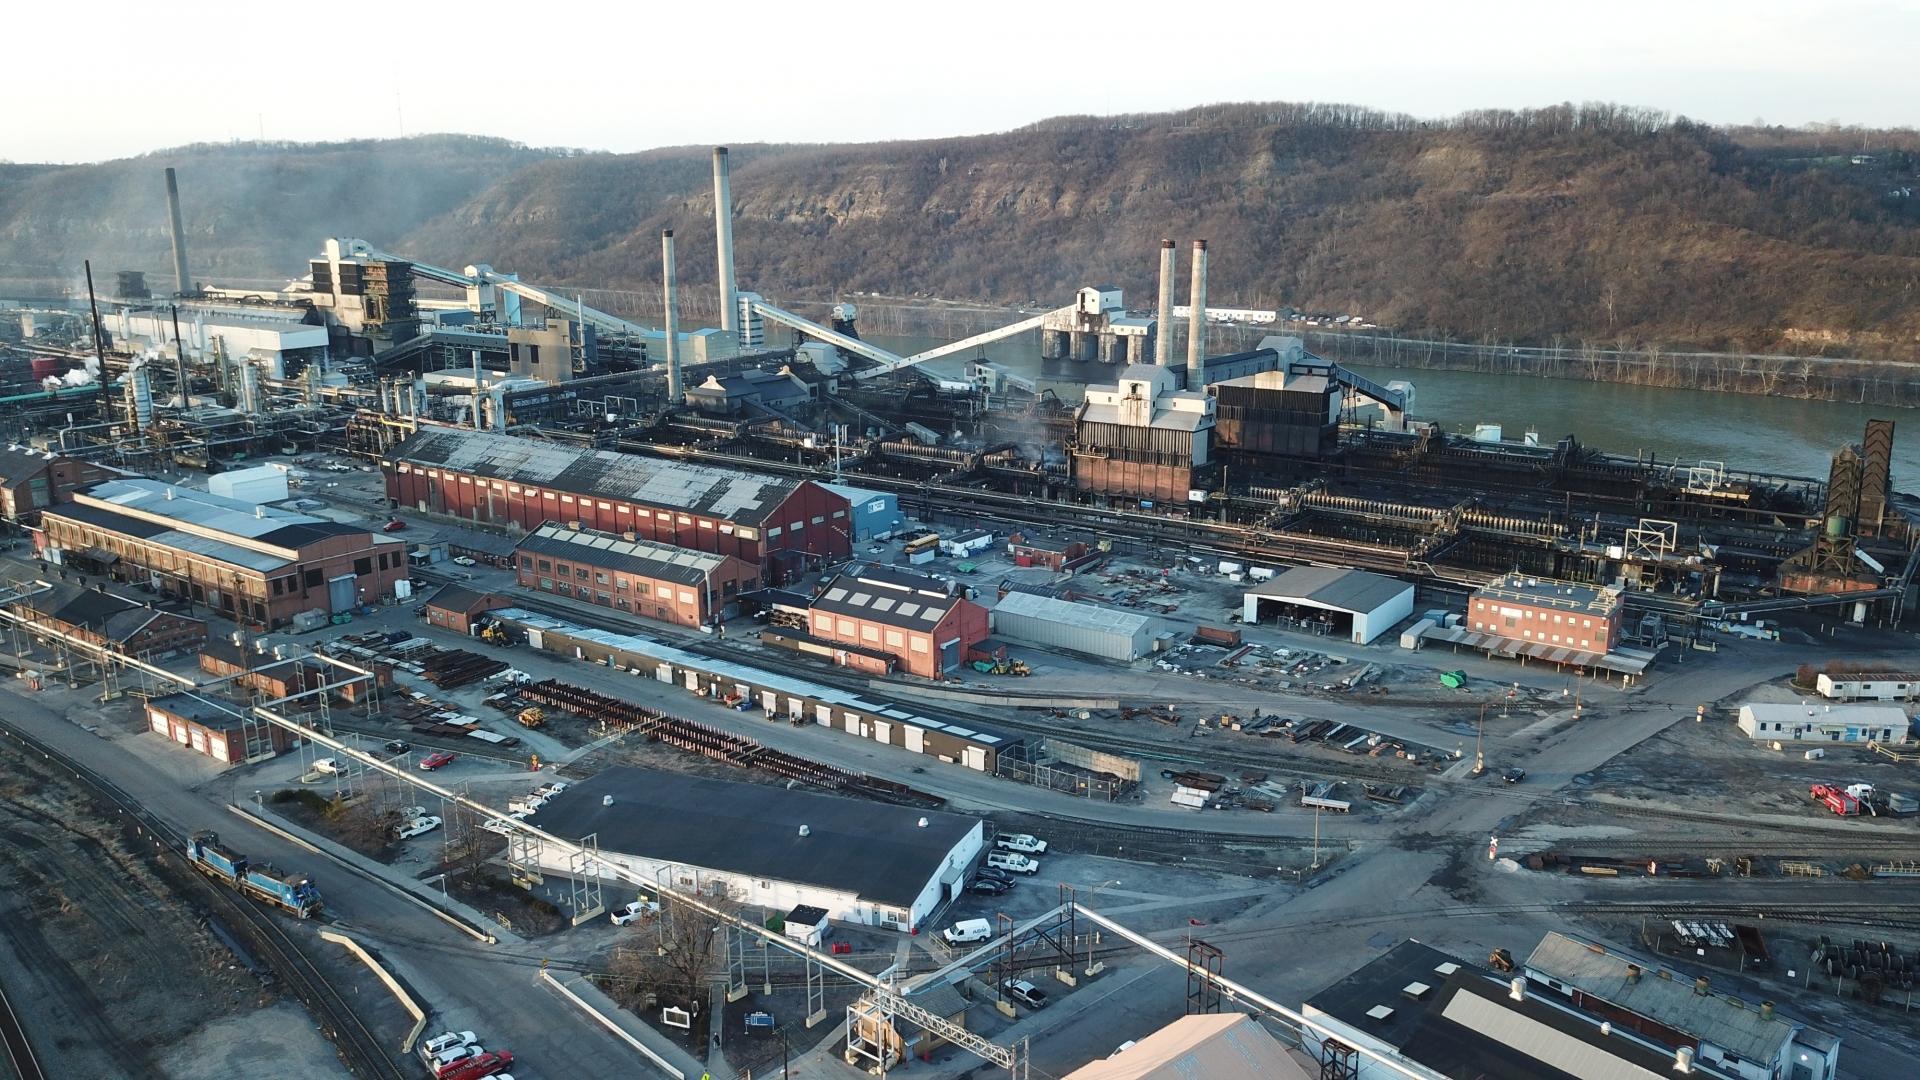 U.S. Steel Clairton Works